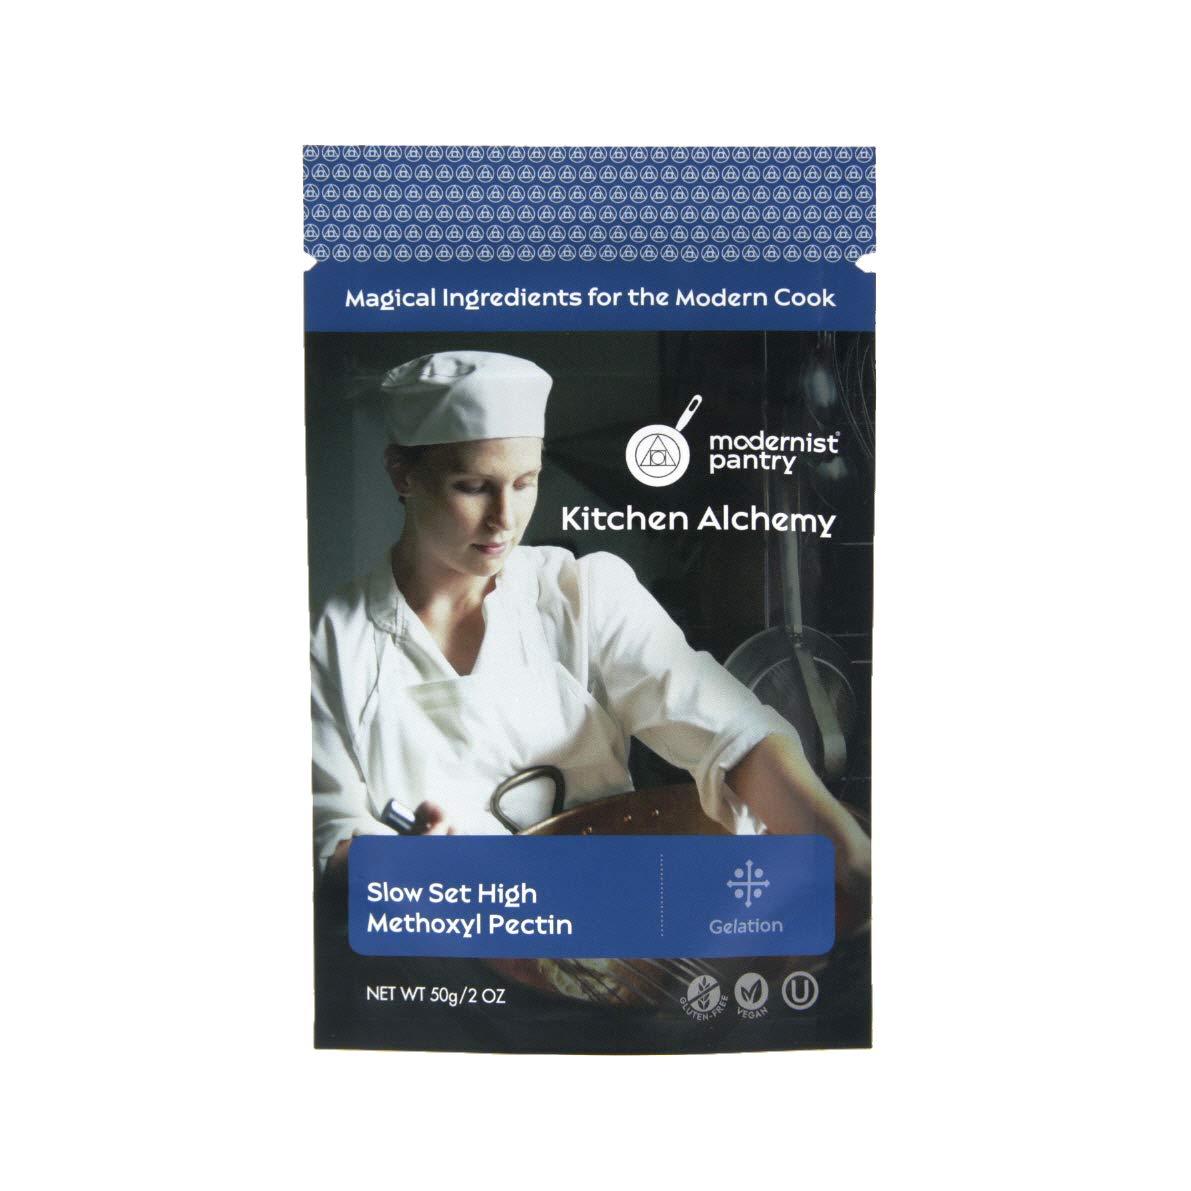 Pectin - Slow Set High Methoxyl ☮ Vegan ✡ OU Kosher Certified - 50g/2oz